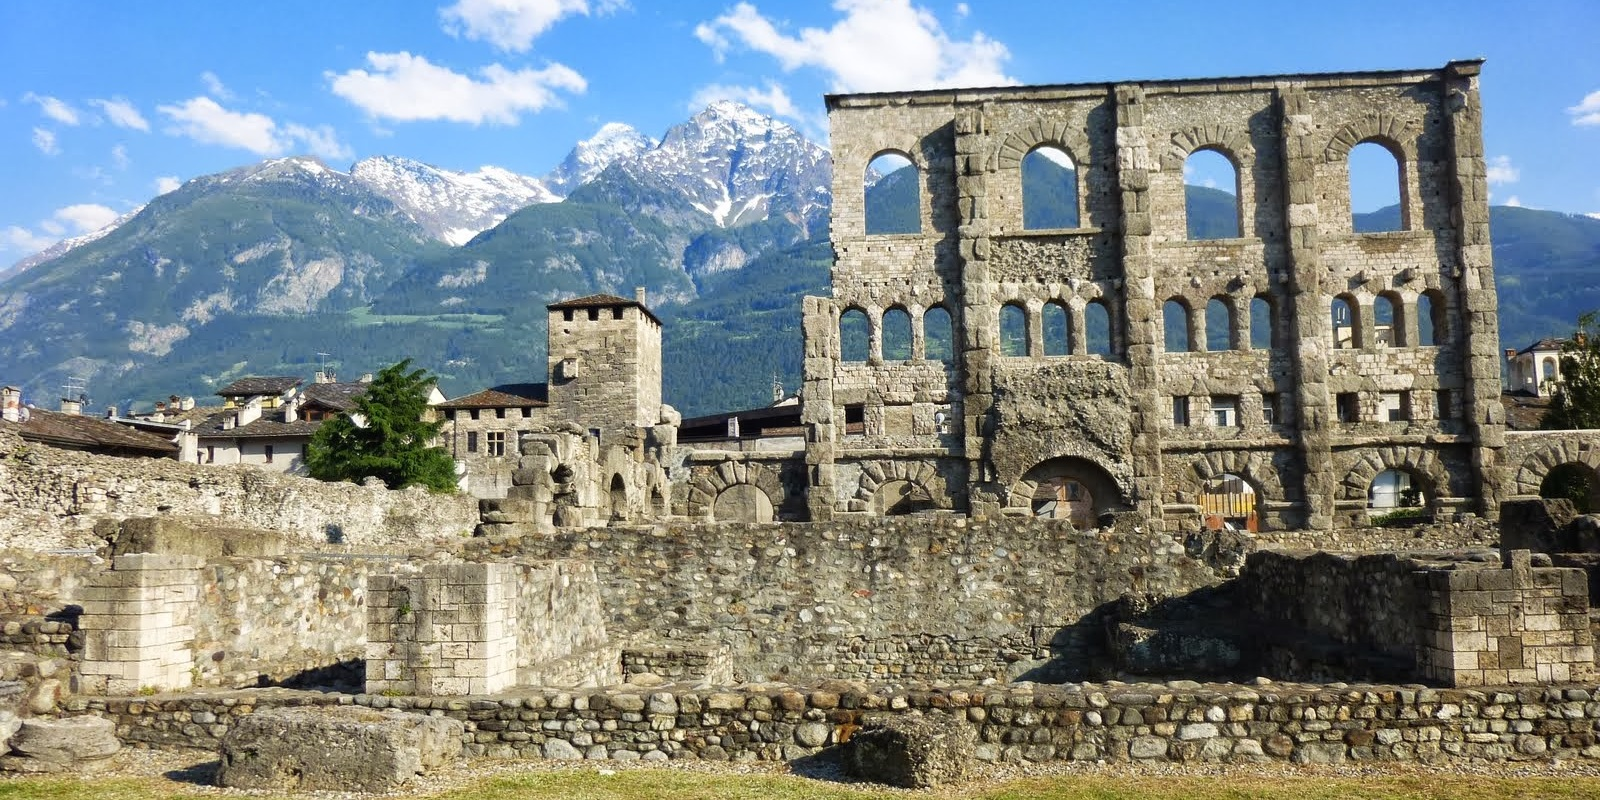 Aosta's guide